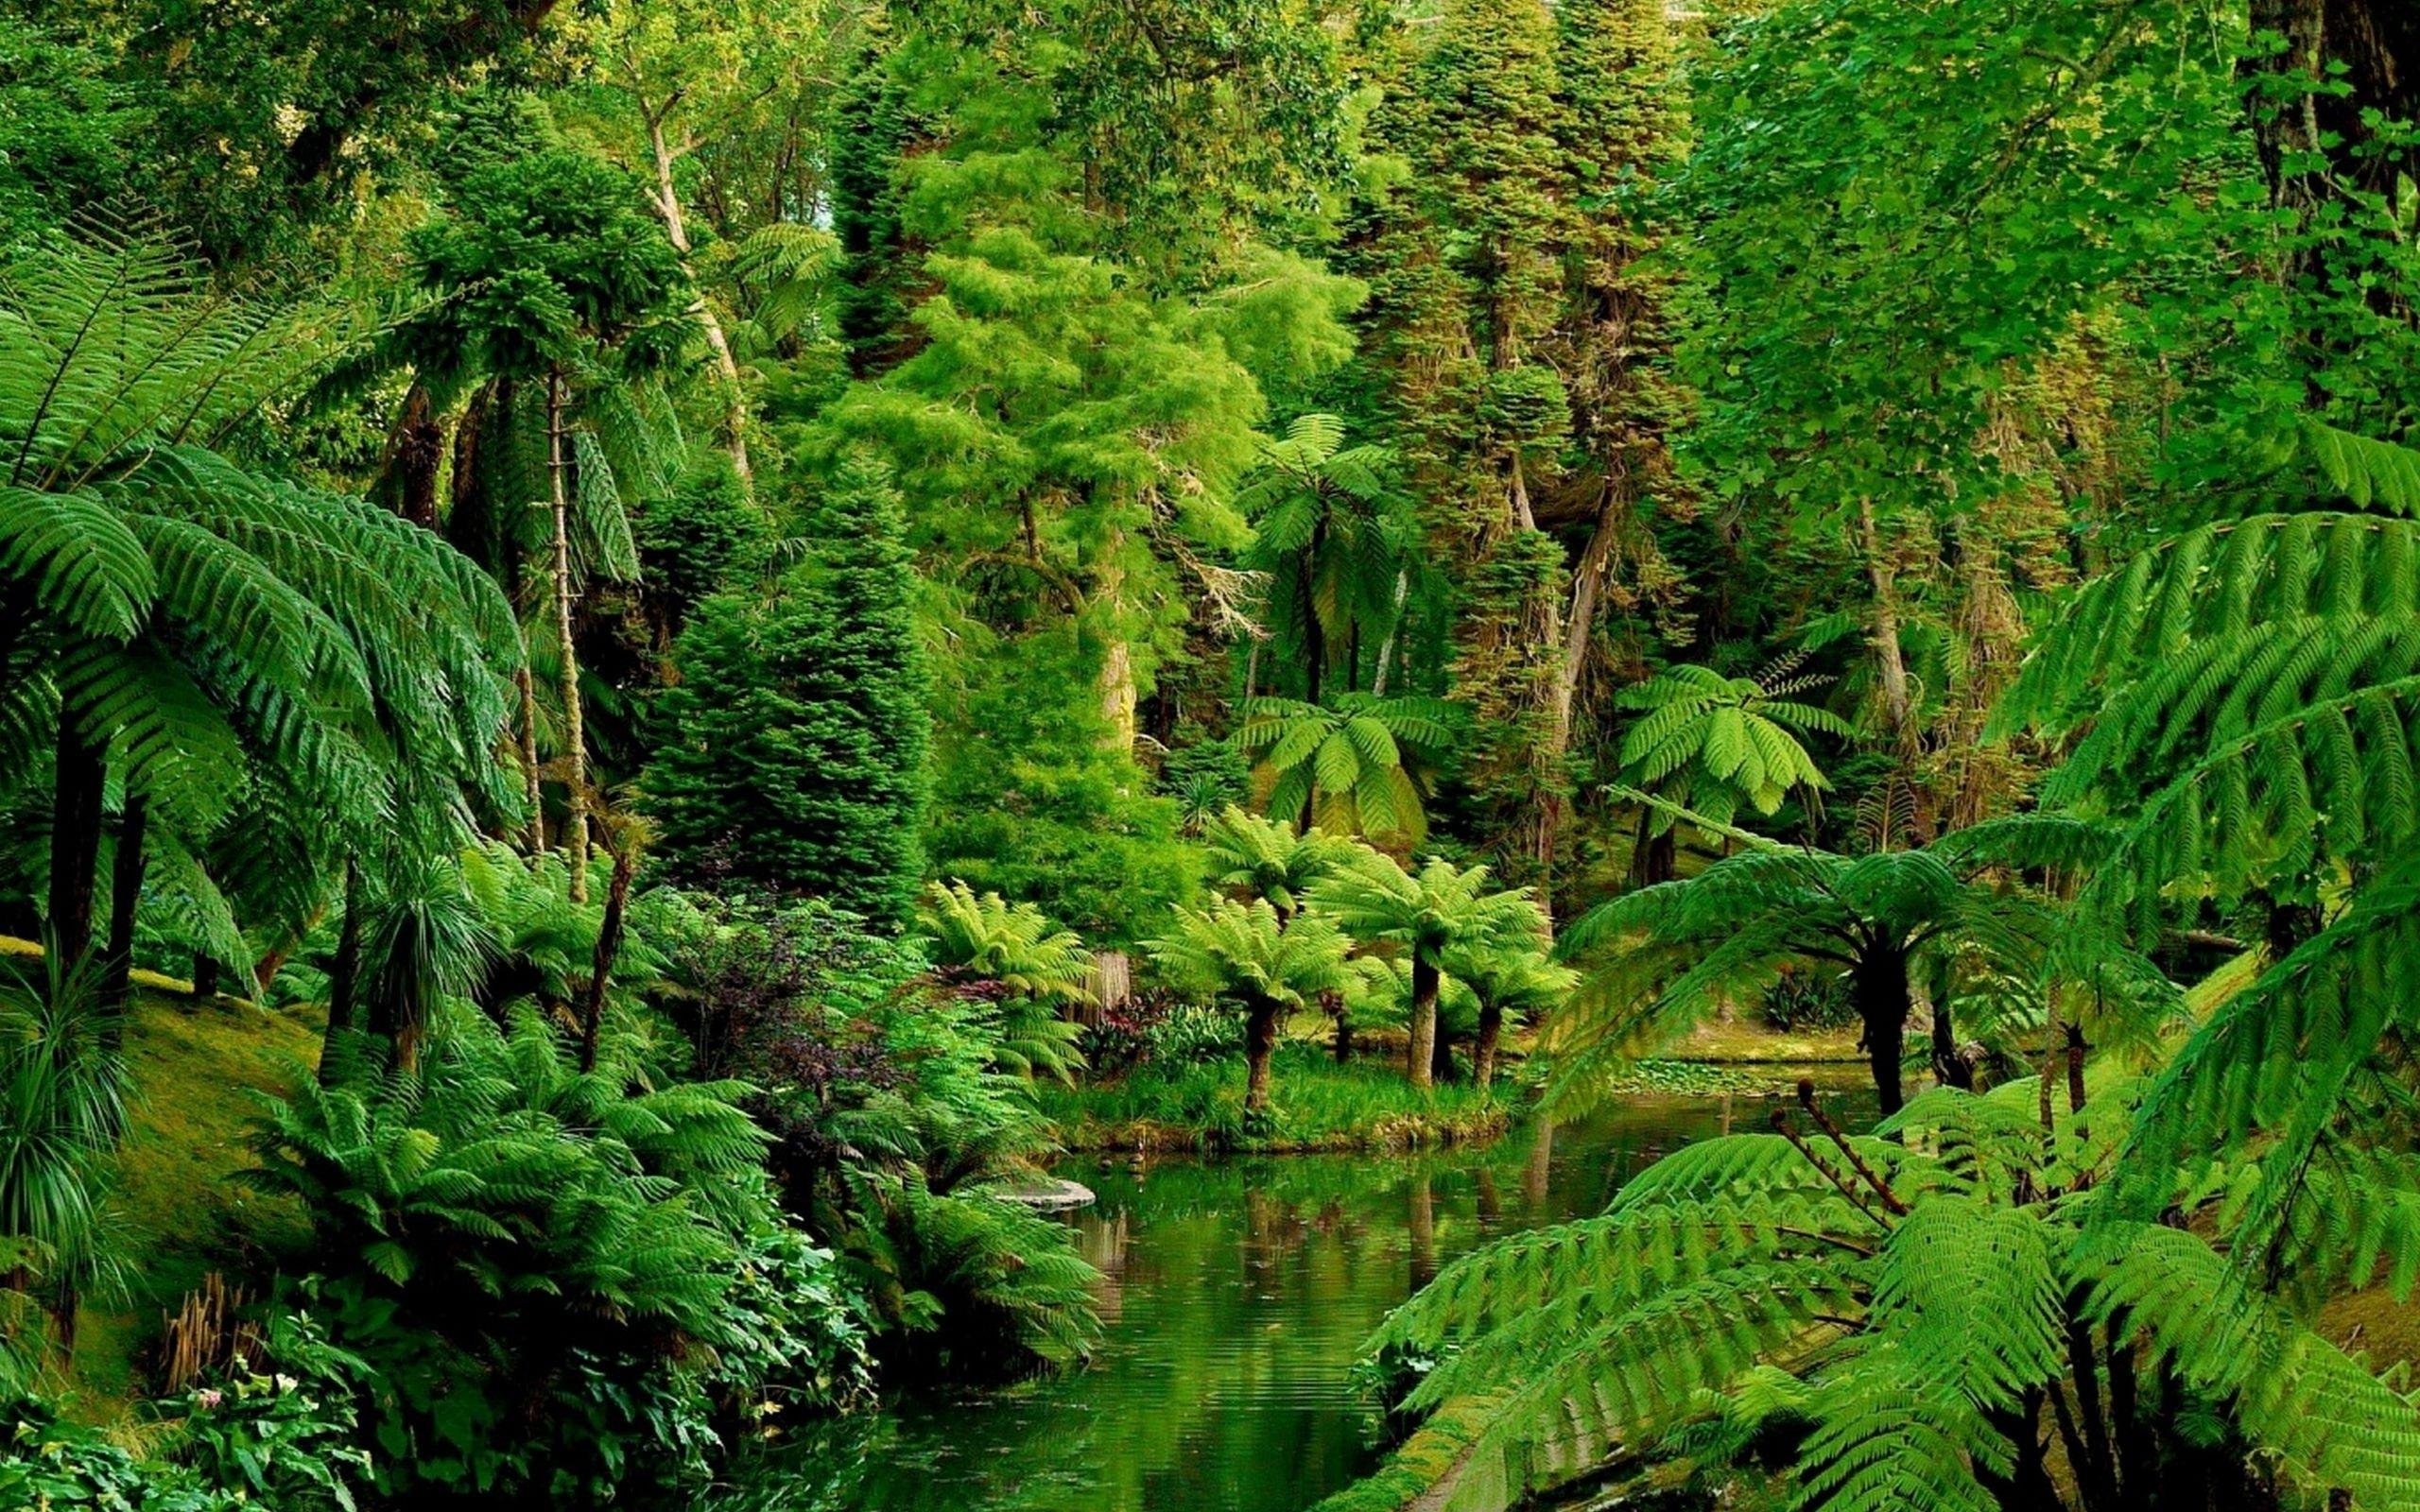 Cool Wallpaper High Quality Forest - Jungle-Desktop-Wallpaper-HD  You Should Have_82766.jpg